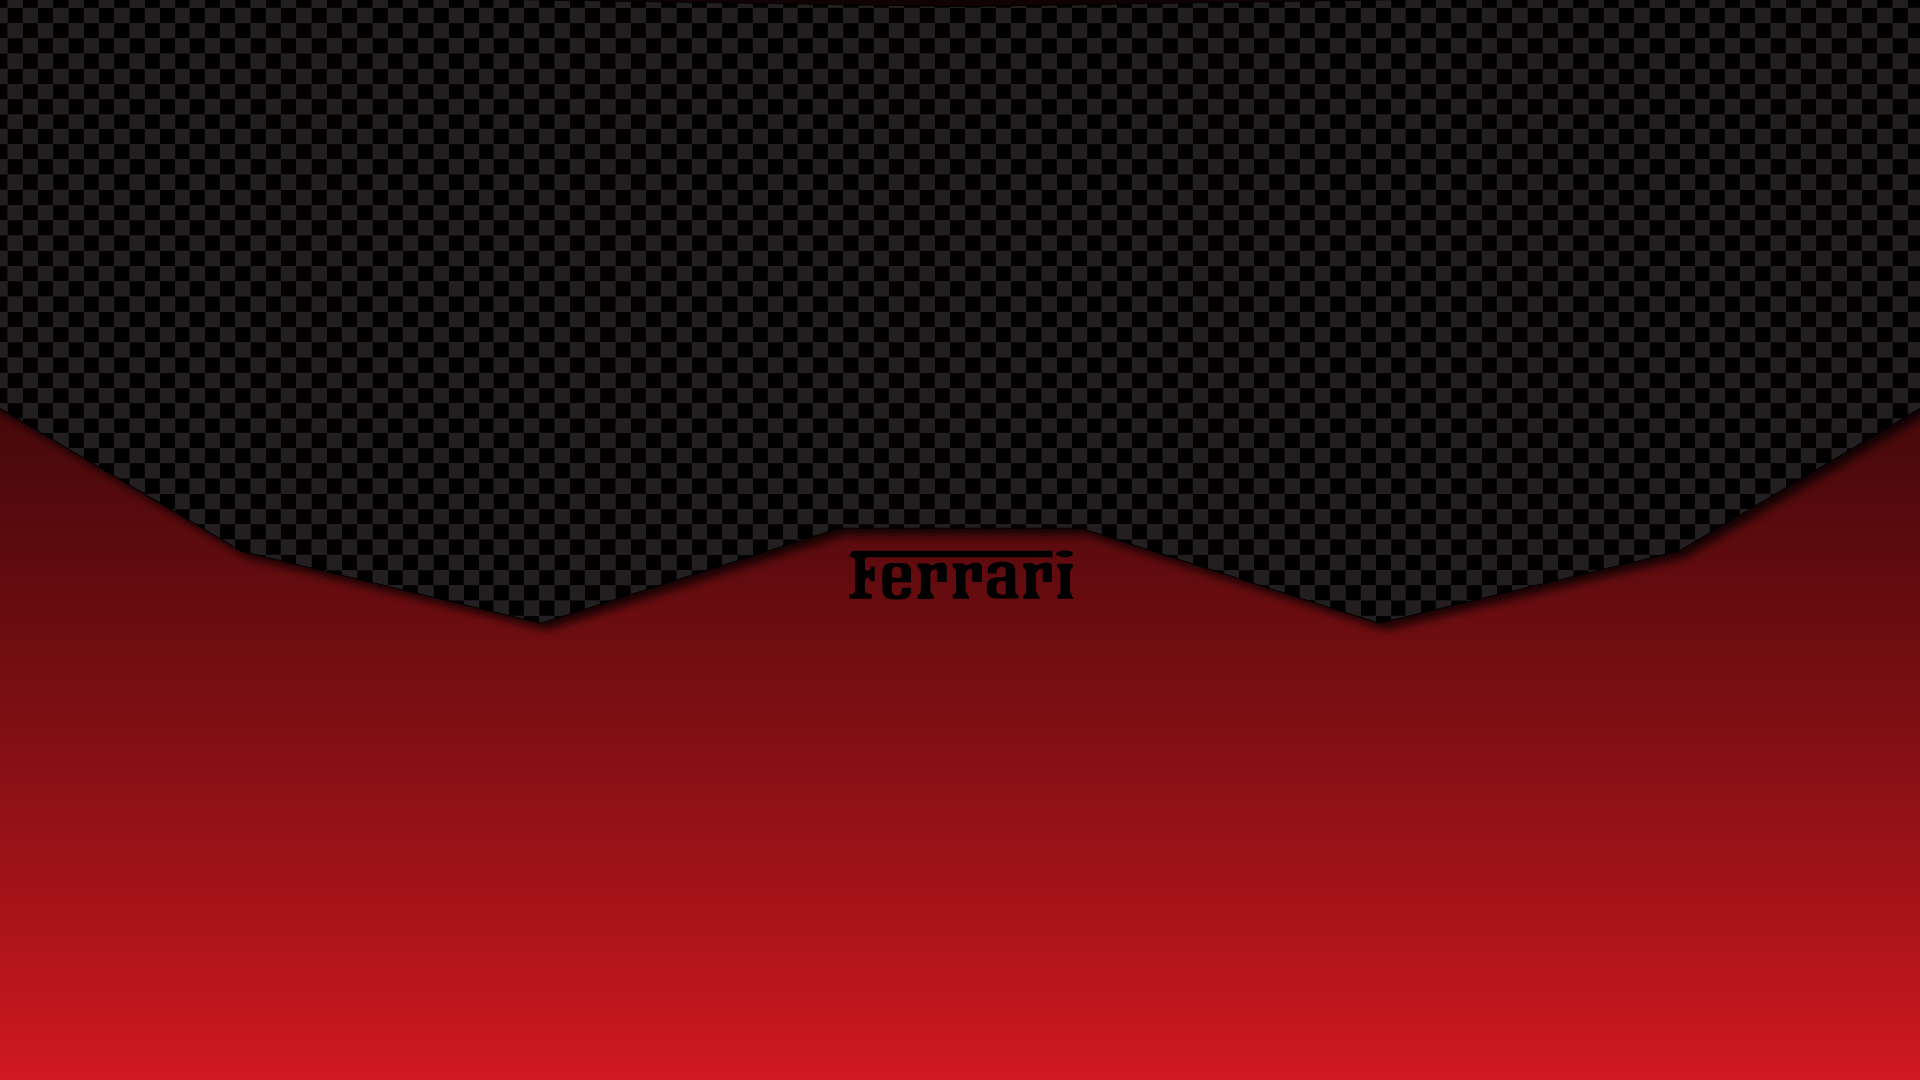 ferrari iphone wallpaper 4k